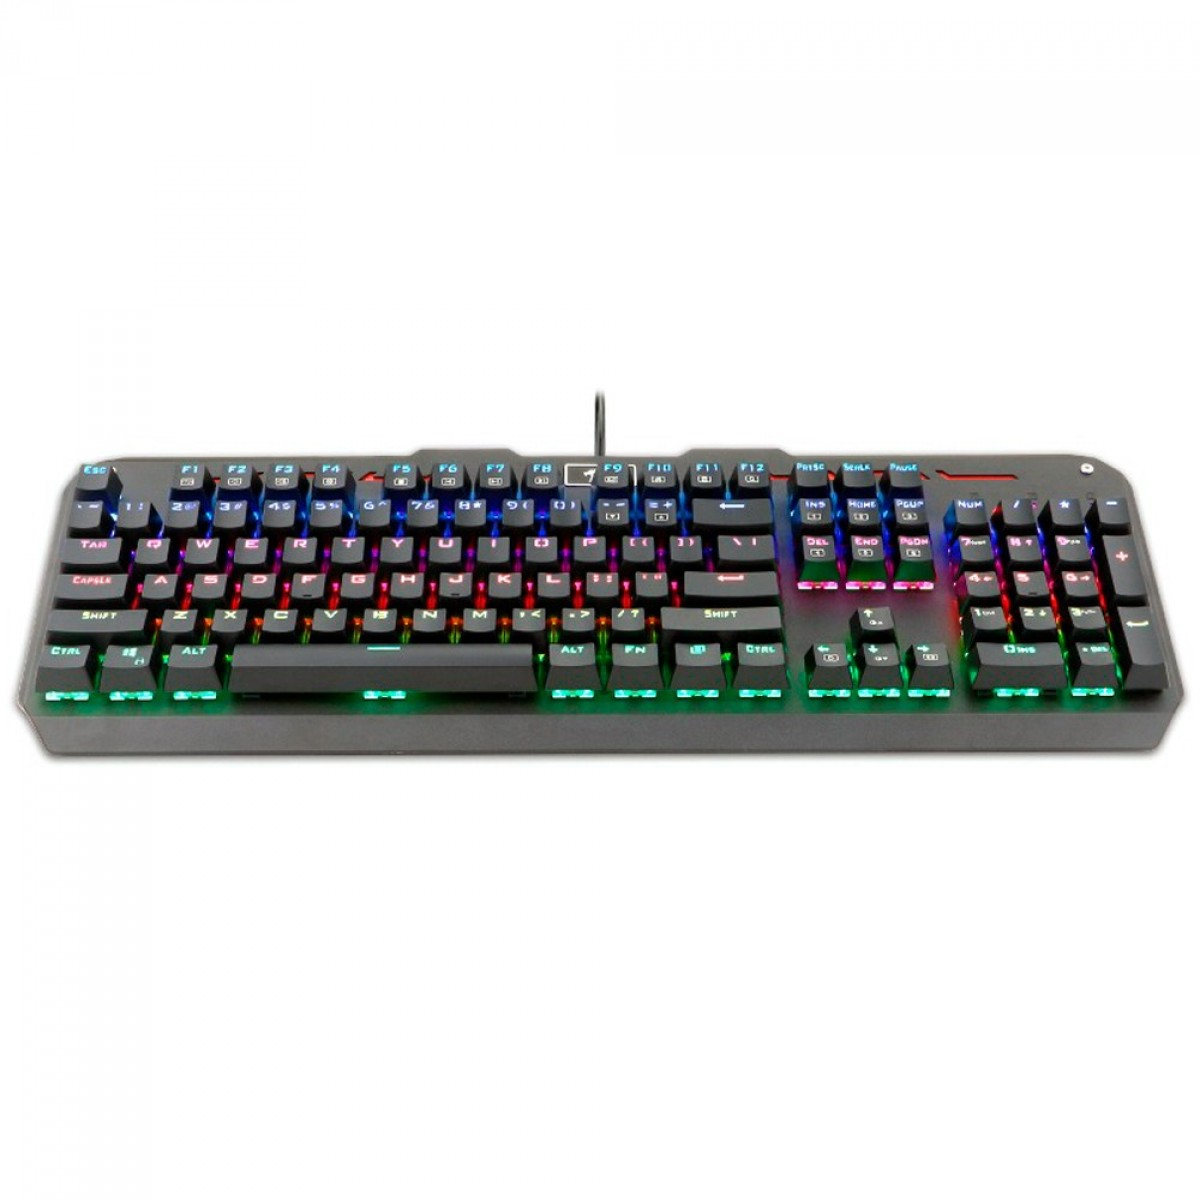 Teclado Mecânico Gamer Redragon Varuna K559 RGB, Switch Red, ABNT2, Black